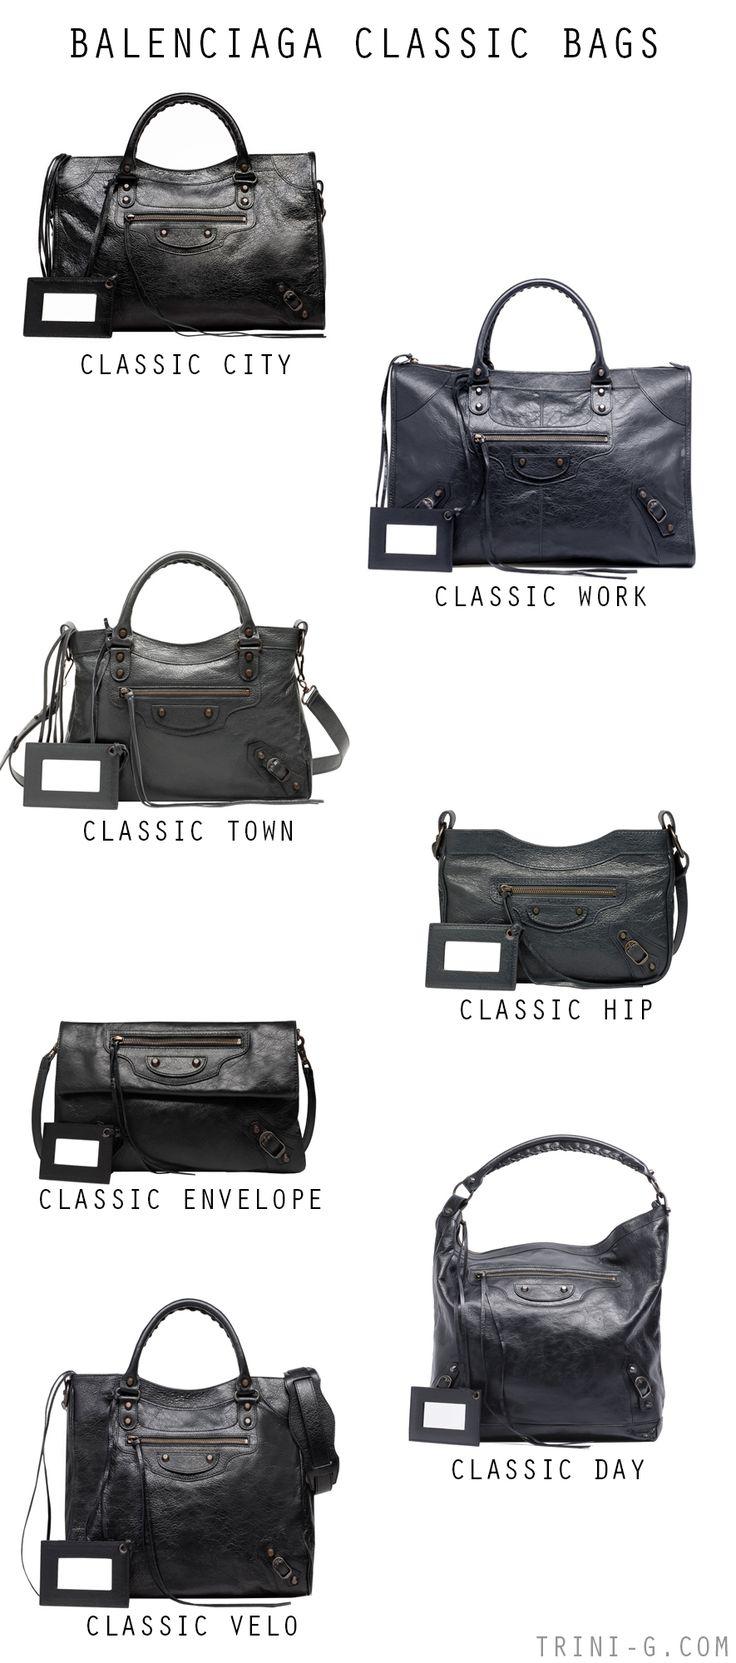 Trini blog | Balenciaga classic bags